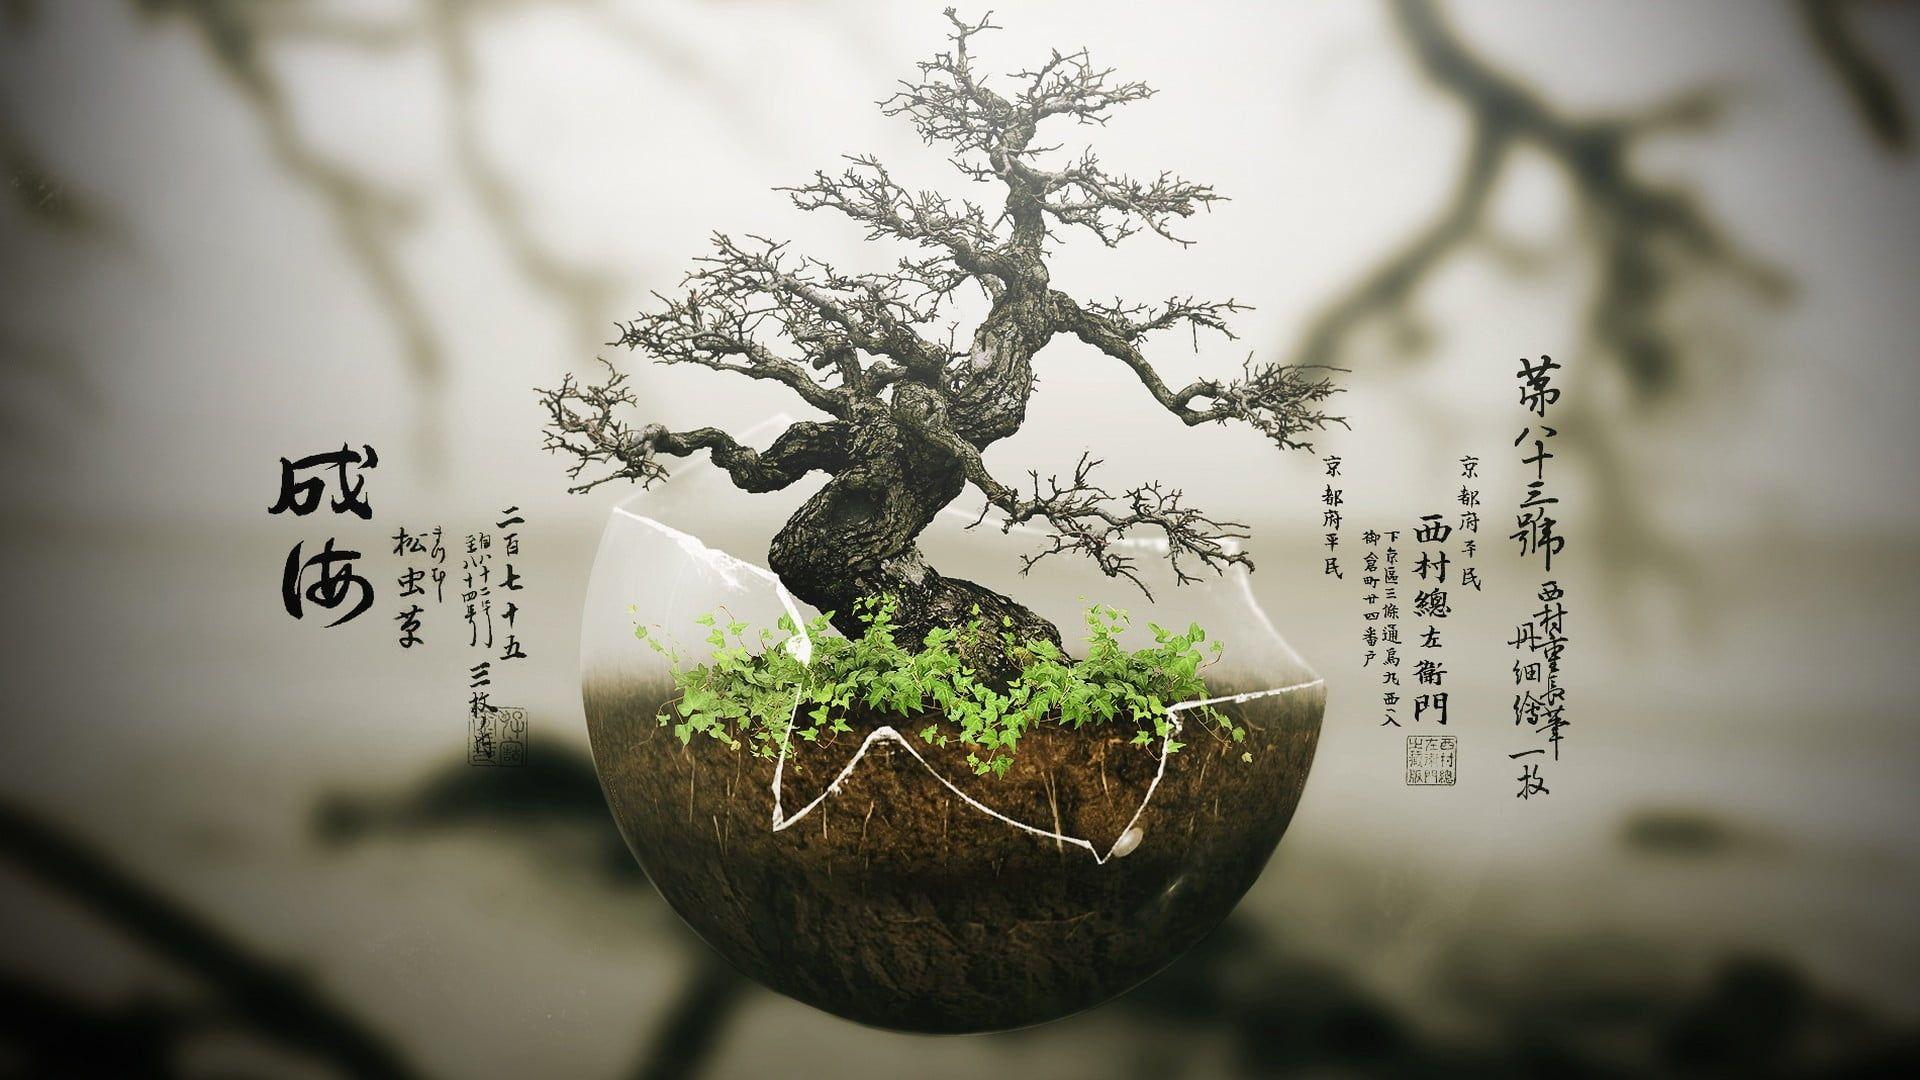 Green Bonsai Tree Bonsai Trees Digital Art Plants Nature 1080p Wallpaper Hdwallpaper Desktop Bonsai Baum 3 D